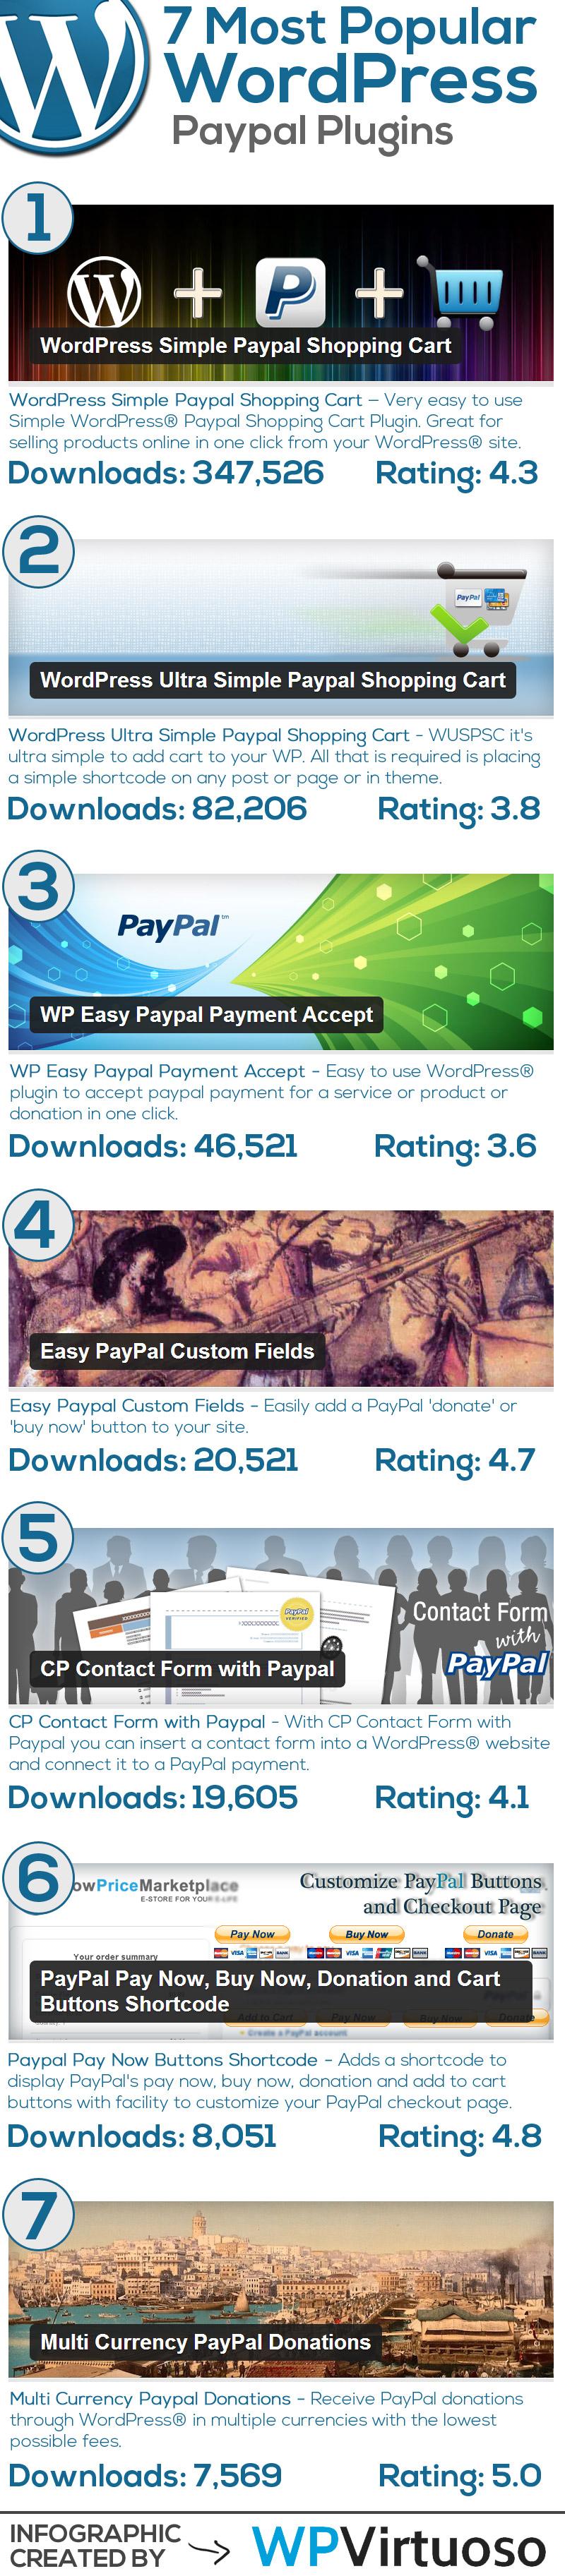 Best-Wordpress-Paypal-Plugins-Infographic